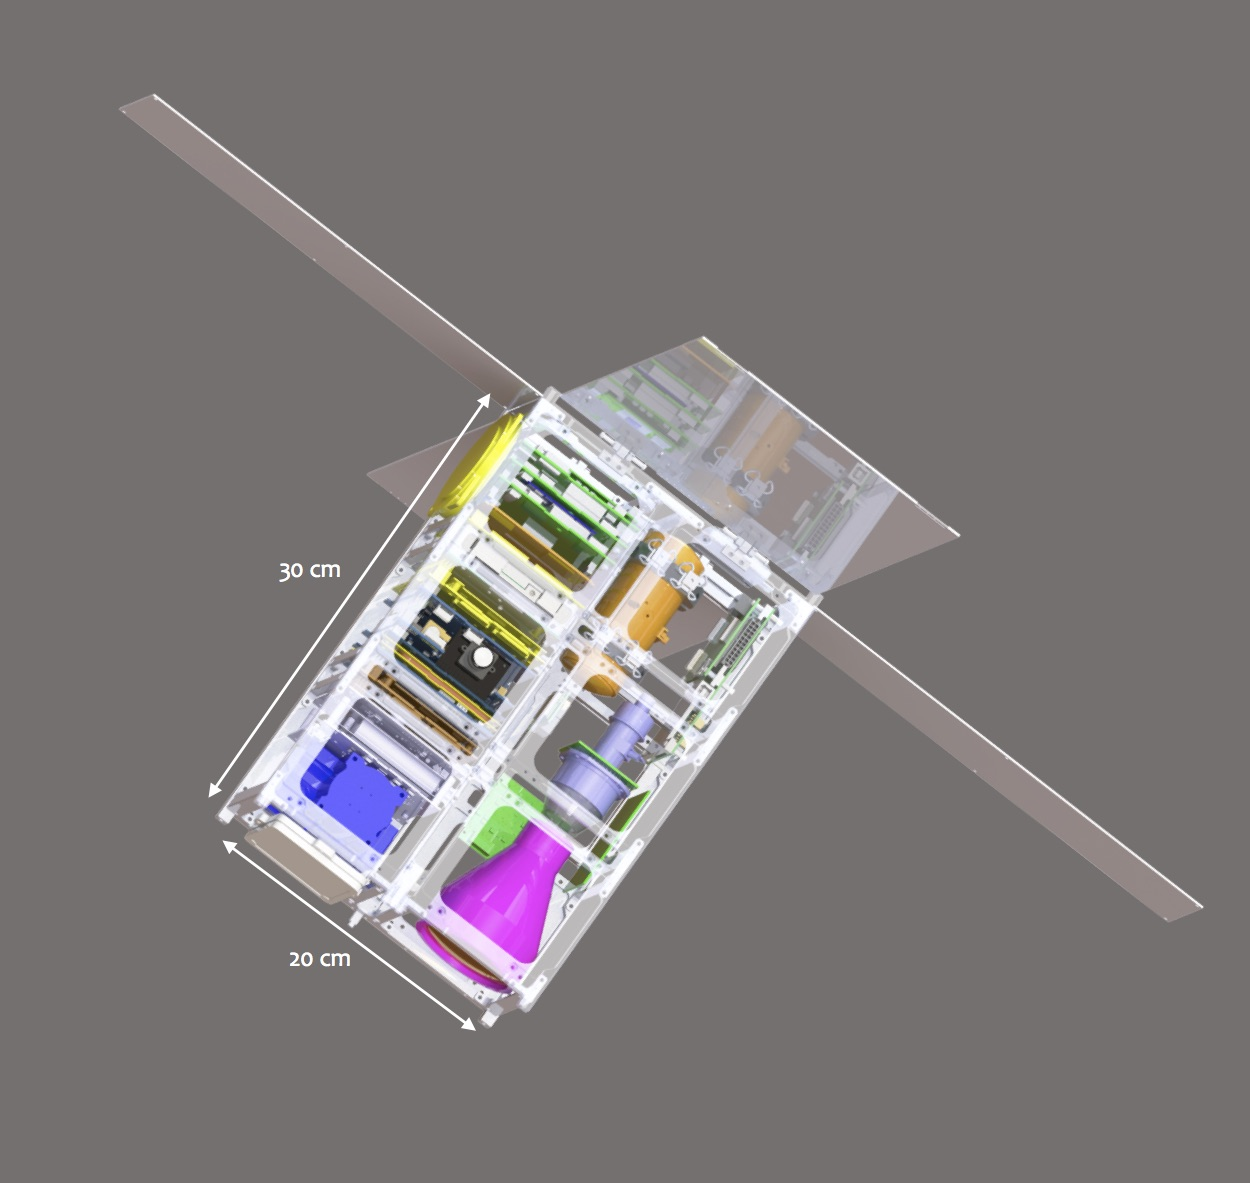 Schematic of the HyTI nanosatellite. Credit: HyTI, UH Mānoa.